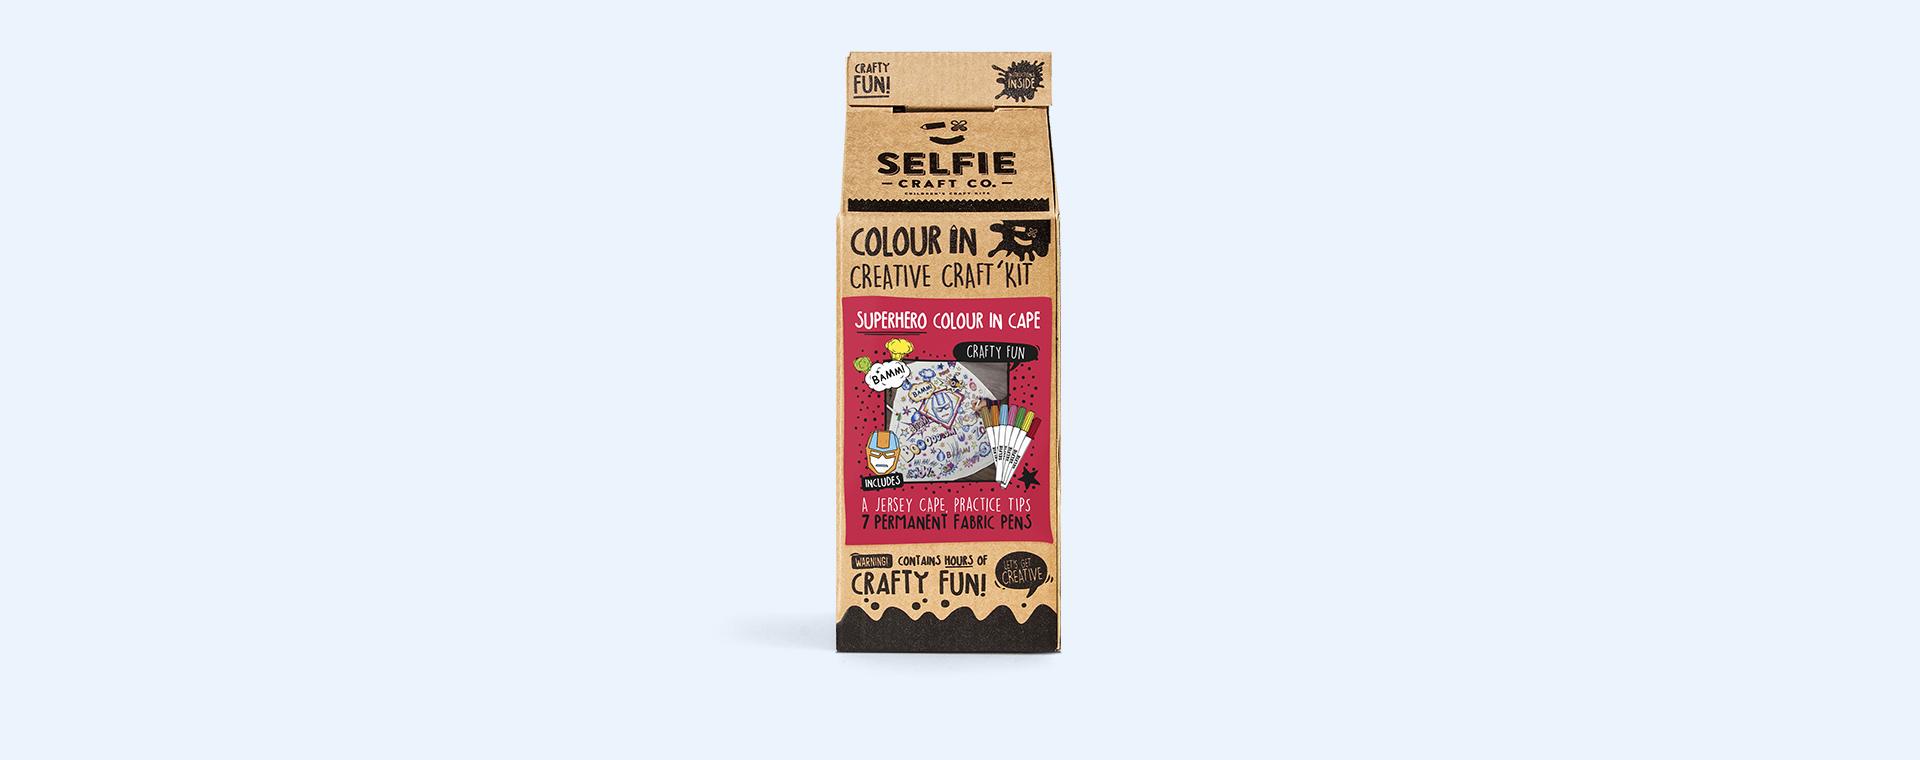 Superhero Selfie Craft Co Colour-In Cape